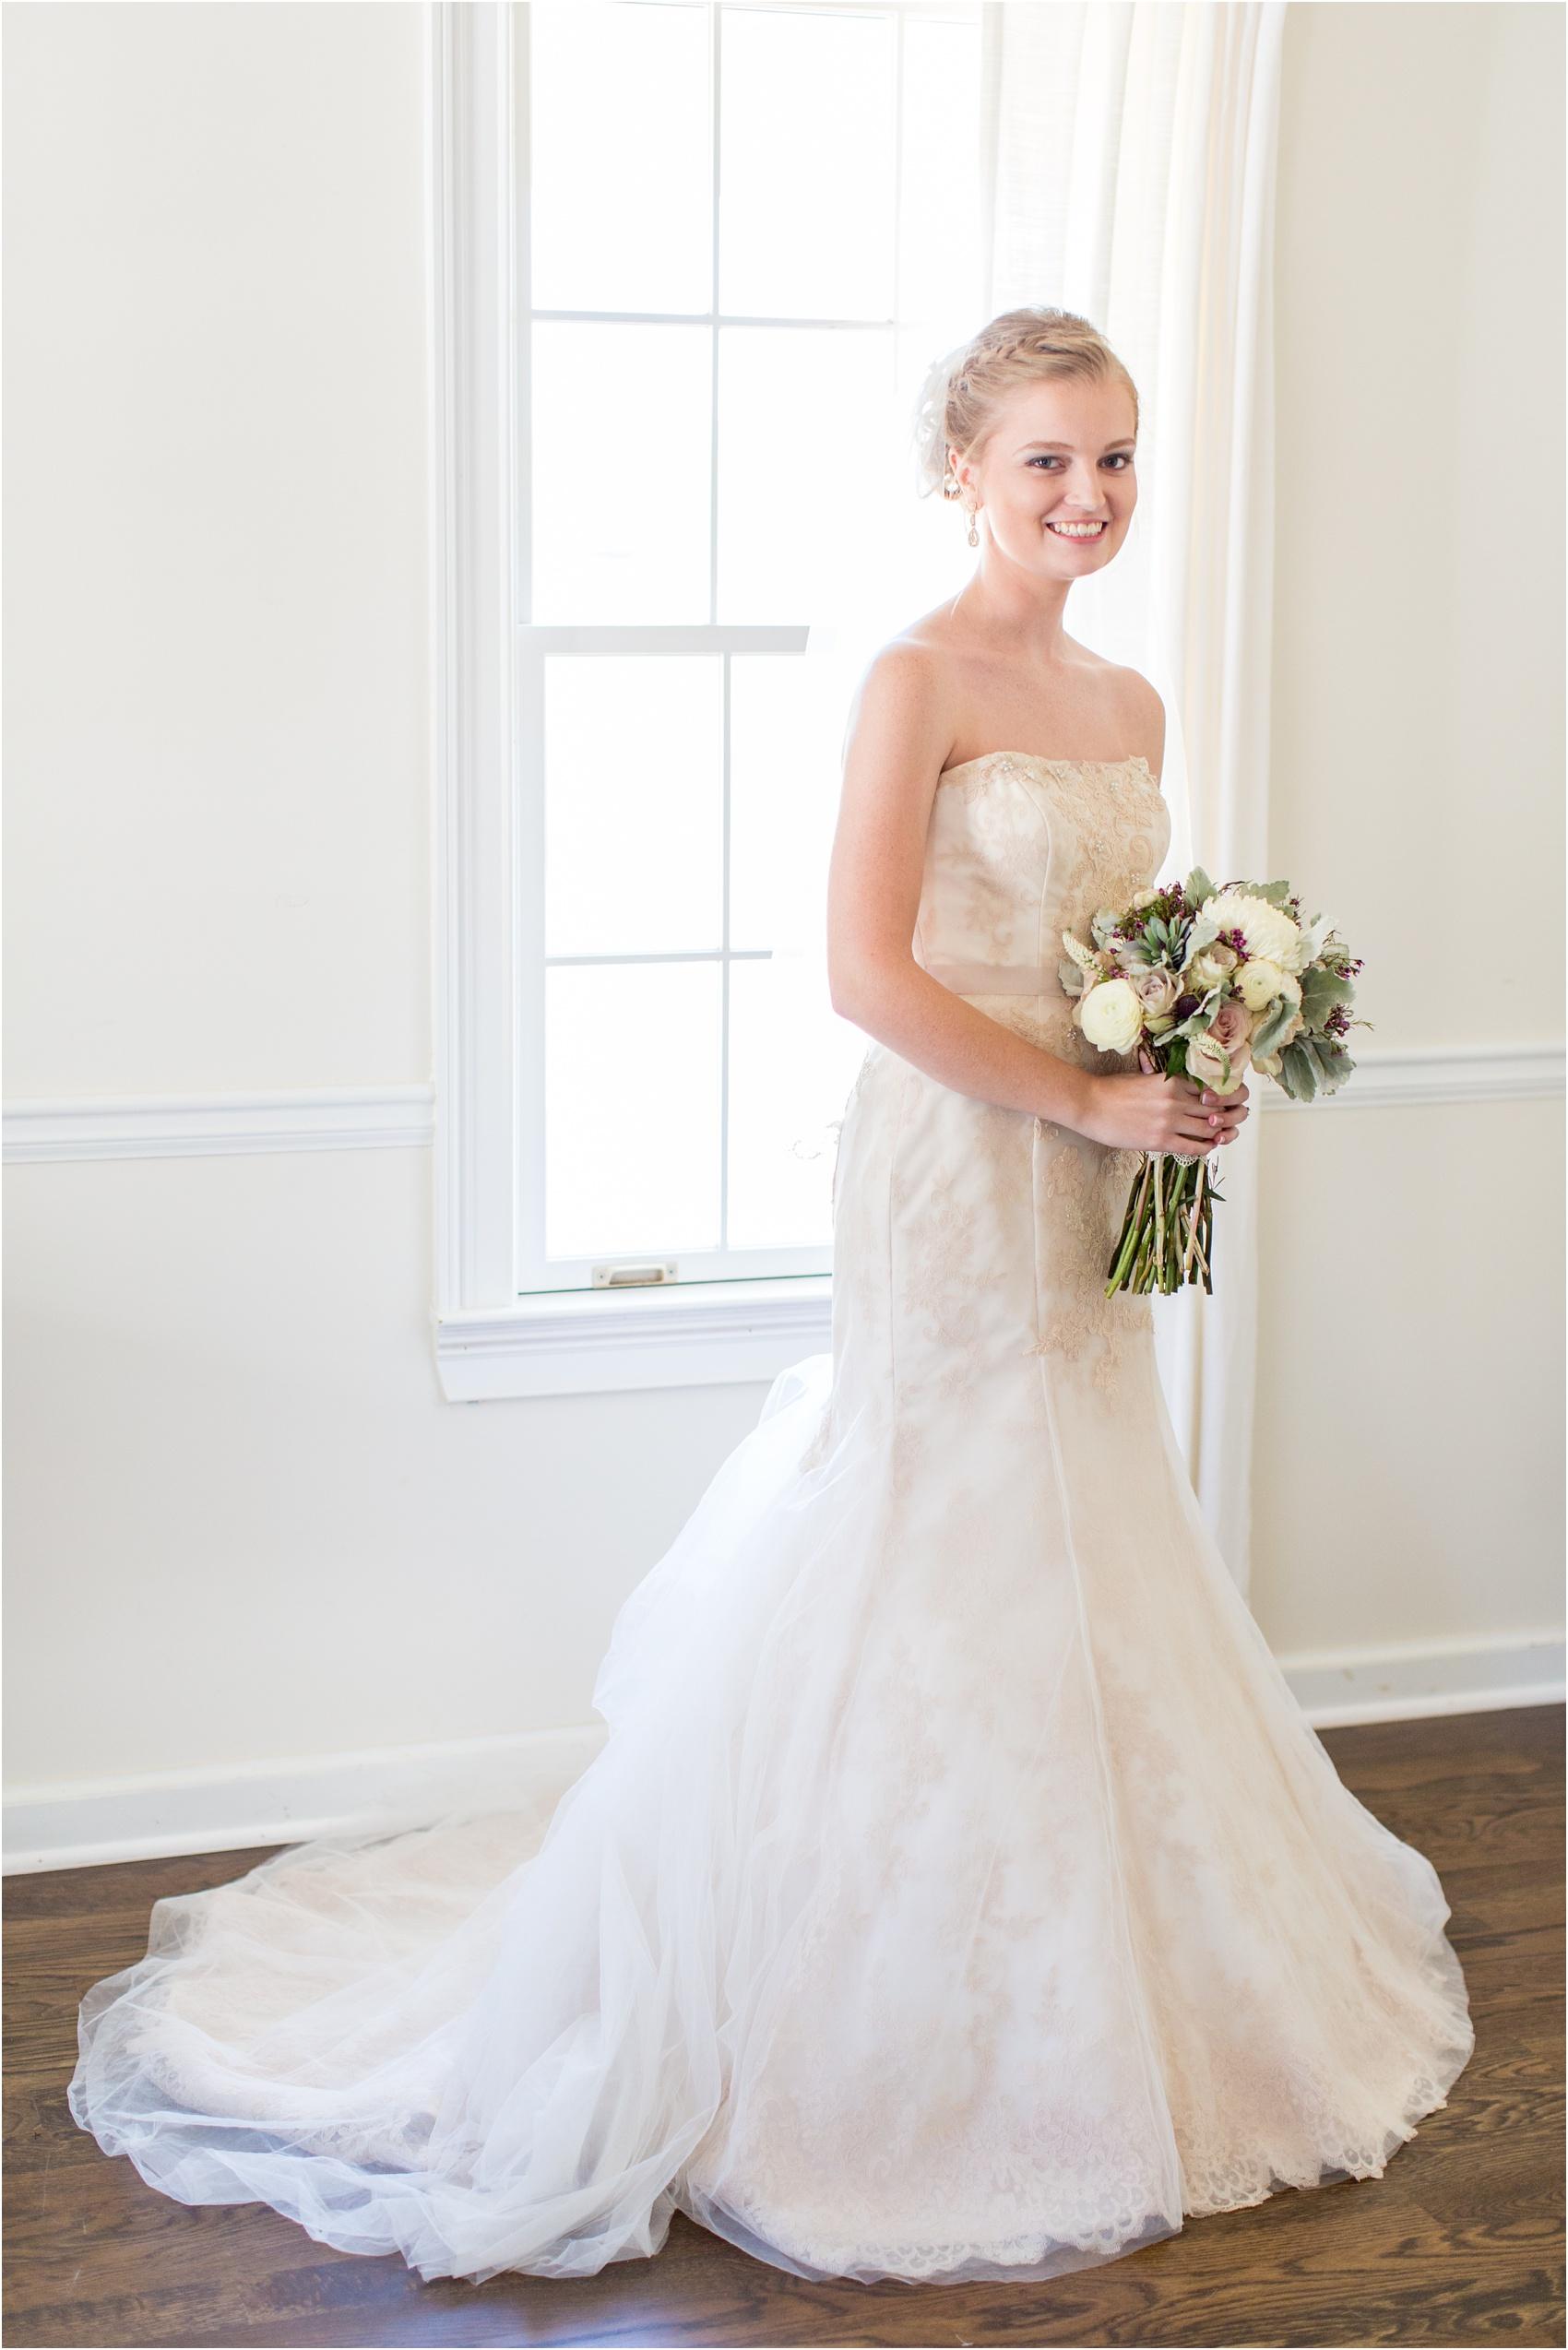 Savannah Eve Photography- Perkins Wedding- Blog-8.jpg